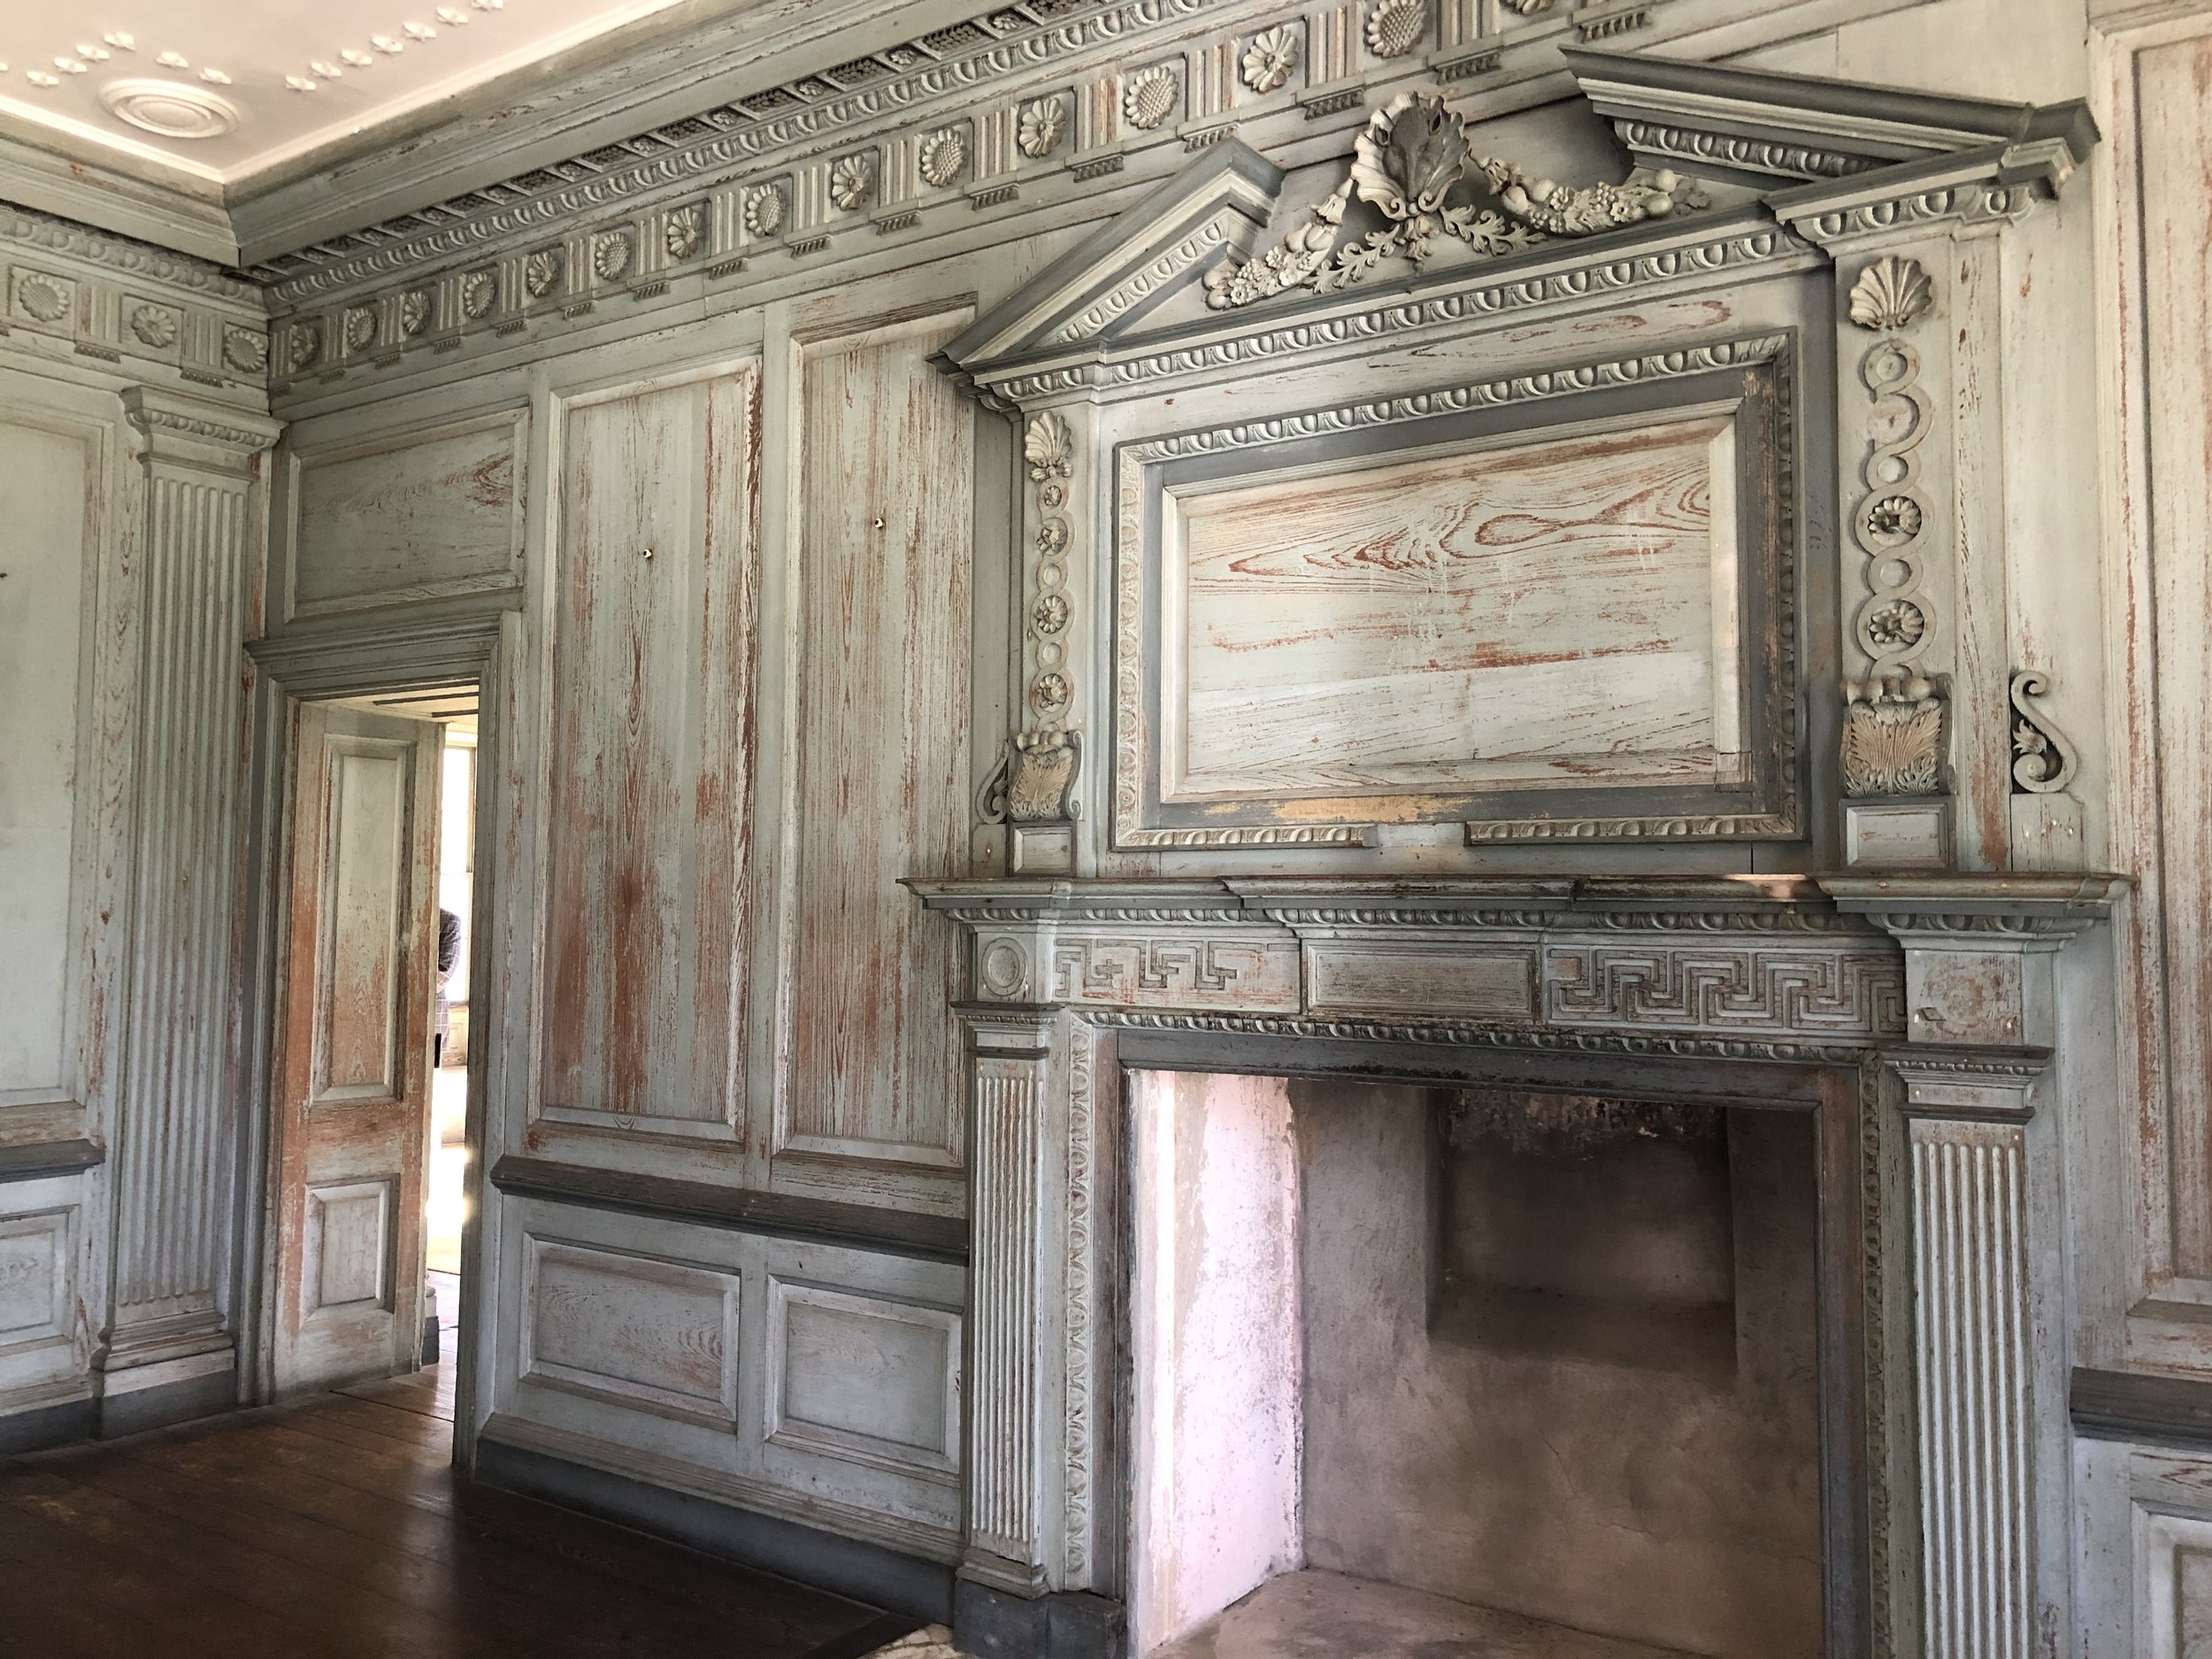 wanderlust-travel-blog-drayton-hall-charleston-entry-room